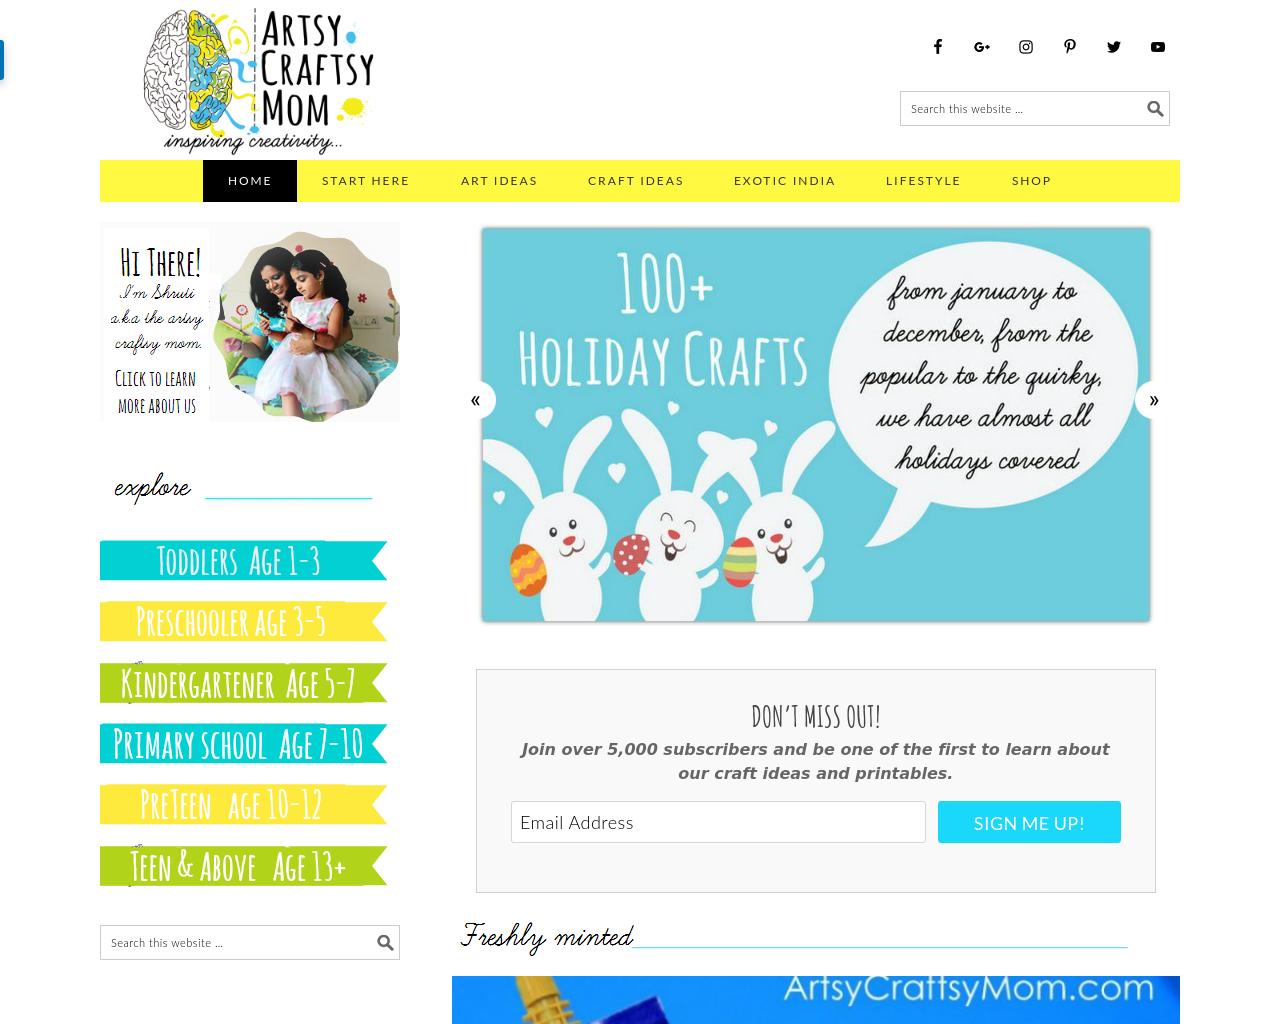 Artsy-Craftsy-Mom-Advertising-Reviews-Pricing